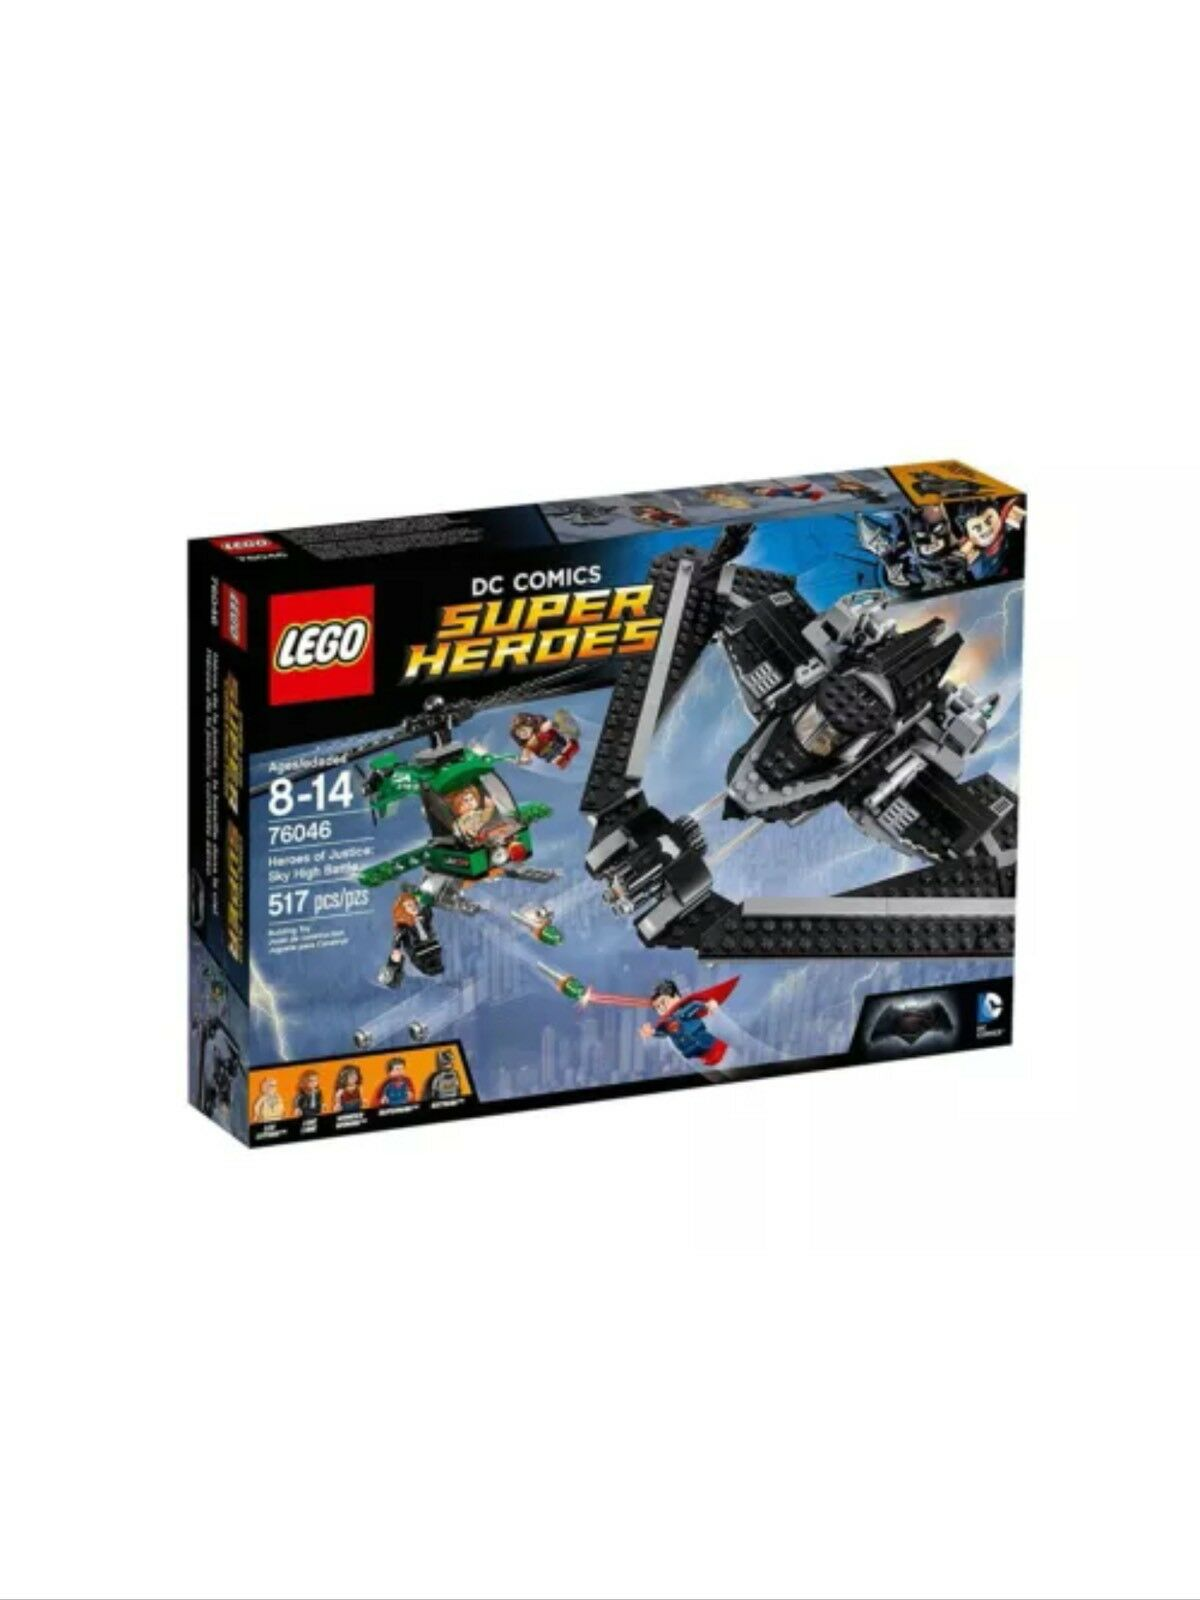 LEGO 76046 BATMAN V SUPERMAN DC SUPER HEROES OF JUSTICE, SKY HIGH battle, NEW 3